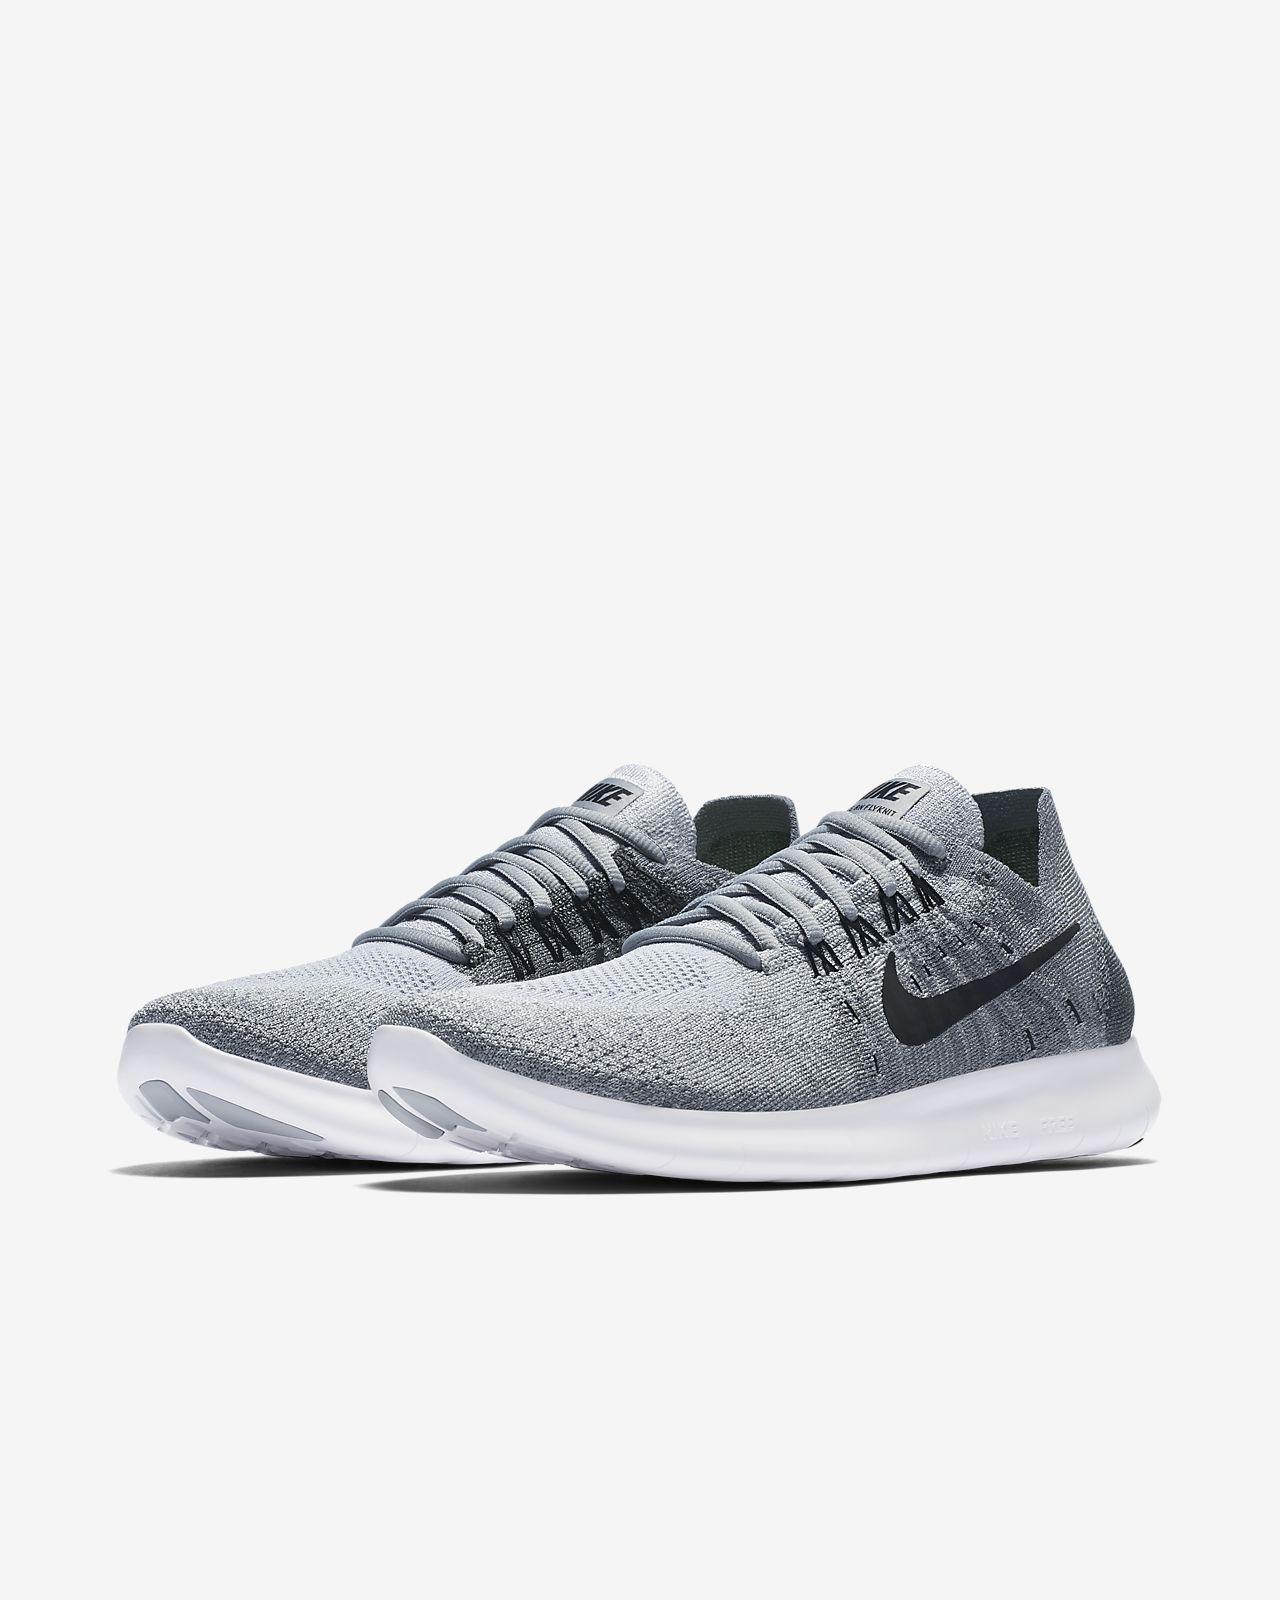 commande Nike Free Run Flyknit 2017 Idée 100% original sortie geniue stockist Livraison gratuite confortable coût de sortie Wy5DfCF